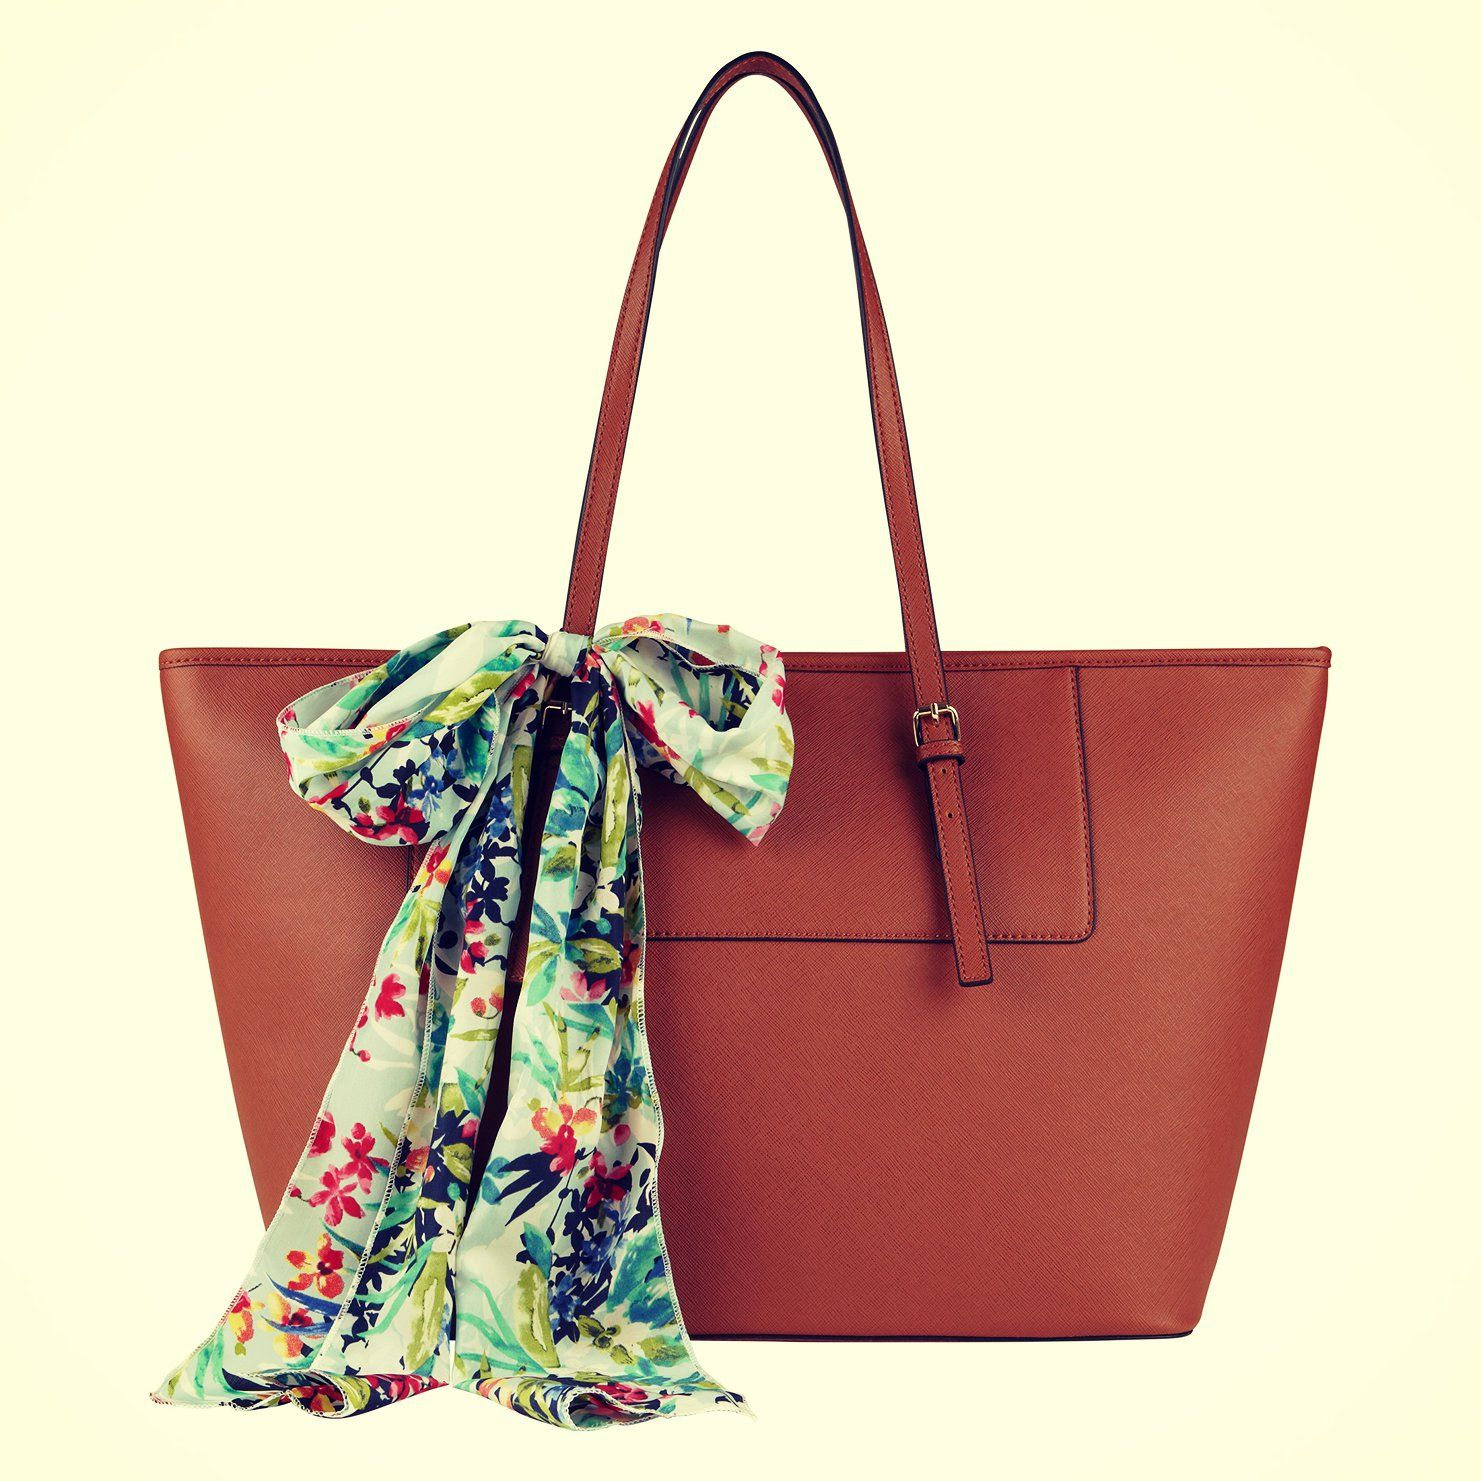 a2731ab20 Hermosa cartera Aldo...un toque fashionista para tu look! #Tpido #Ofertas  #Fashion #Carteras #RepublicaDominicana